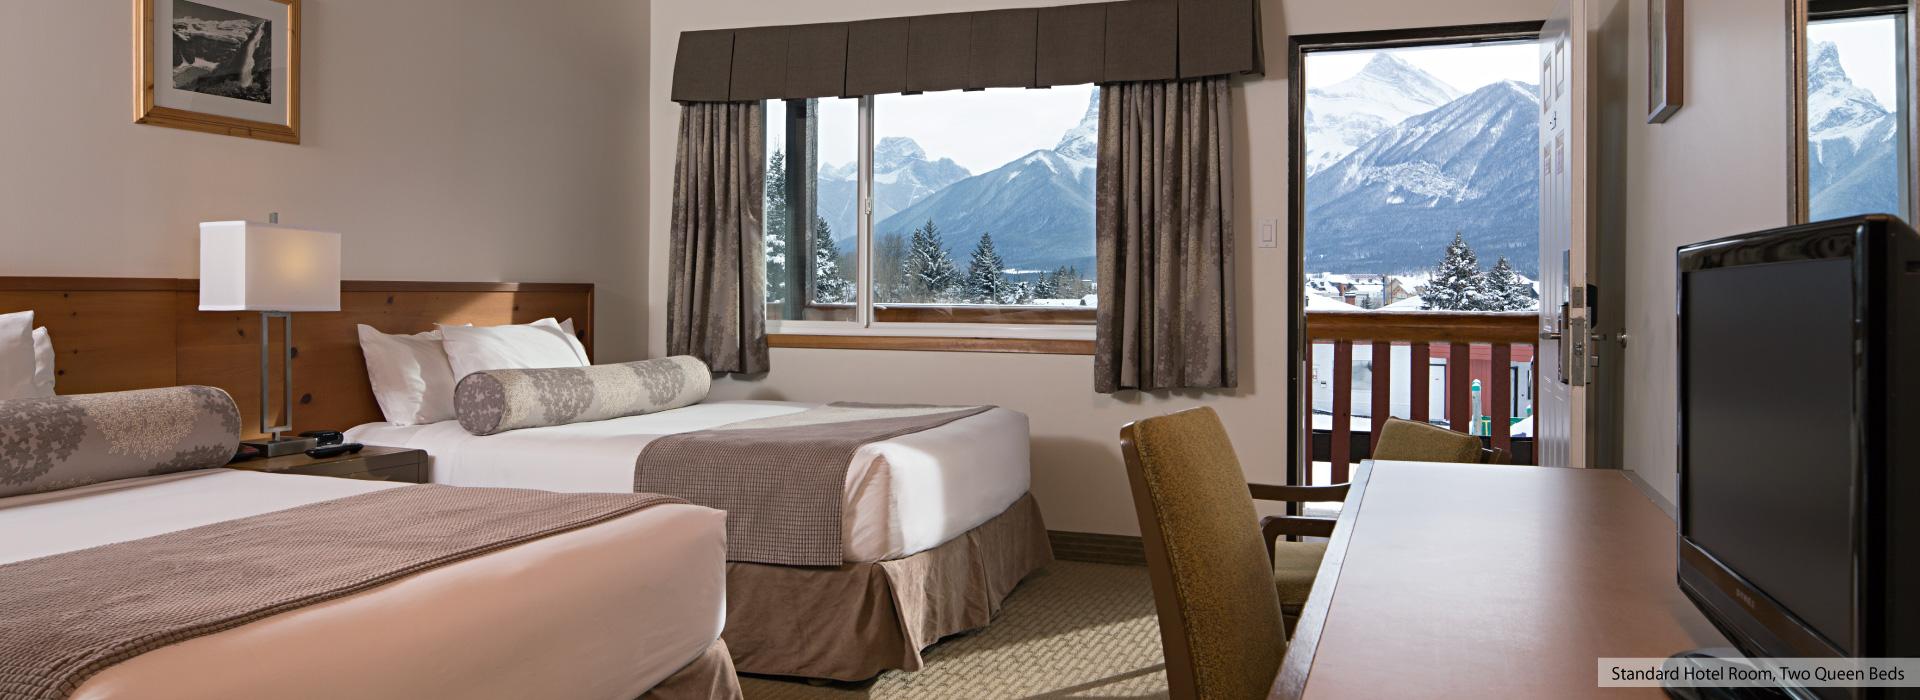 Rocky Mountain Ski Lodge Rooms